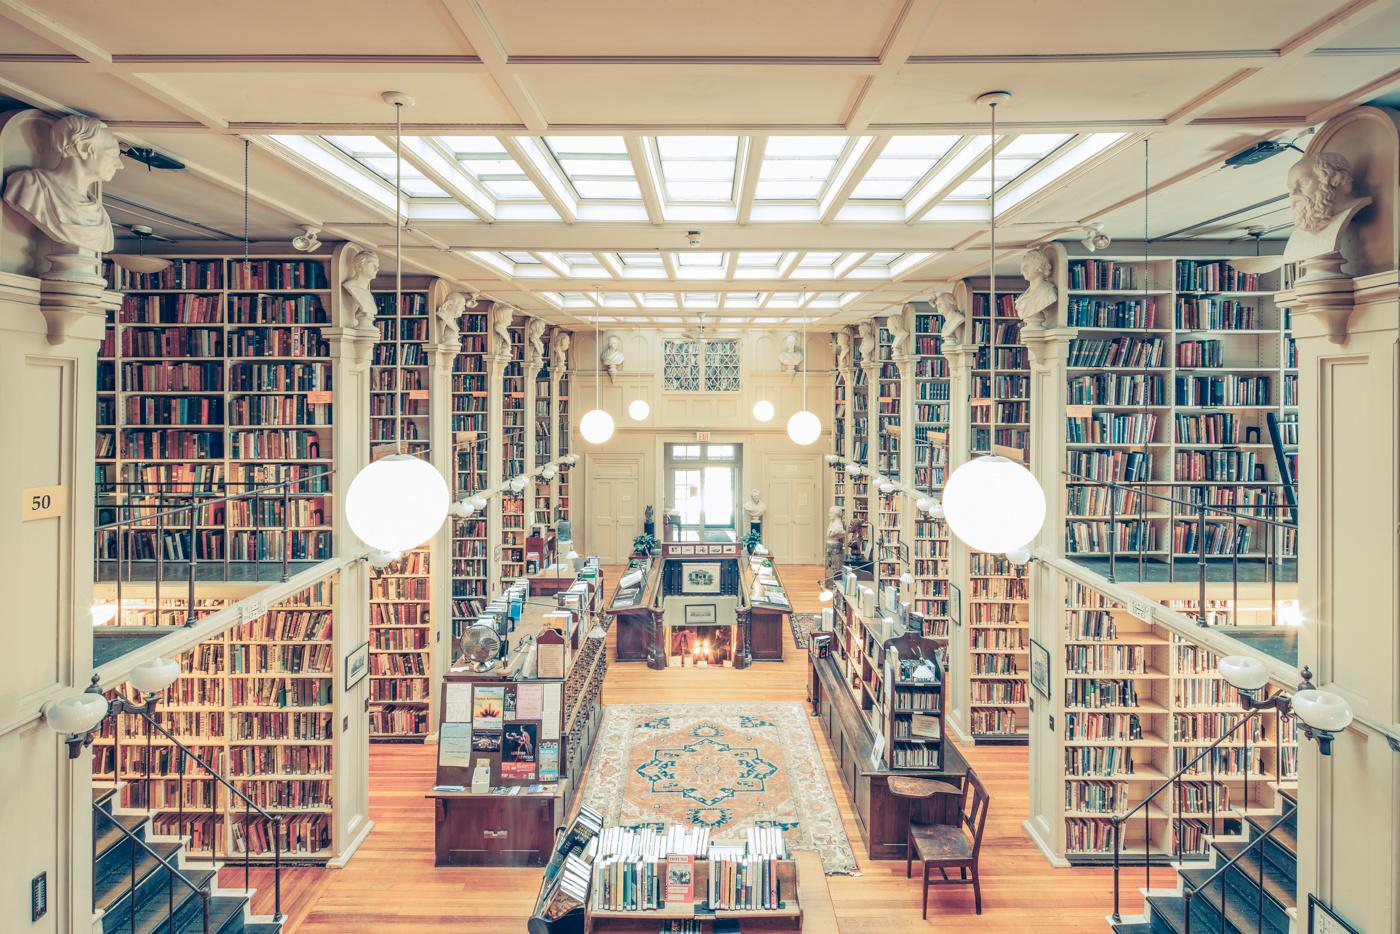 The Providence Athenaeum Library #1, RI, 2015